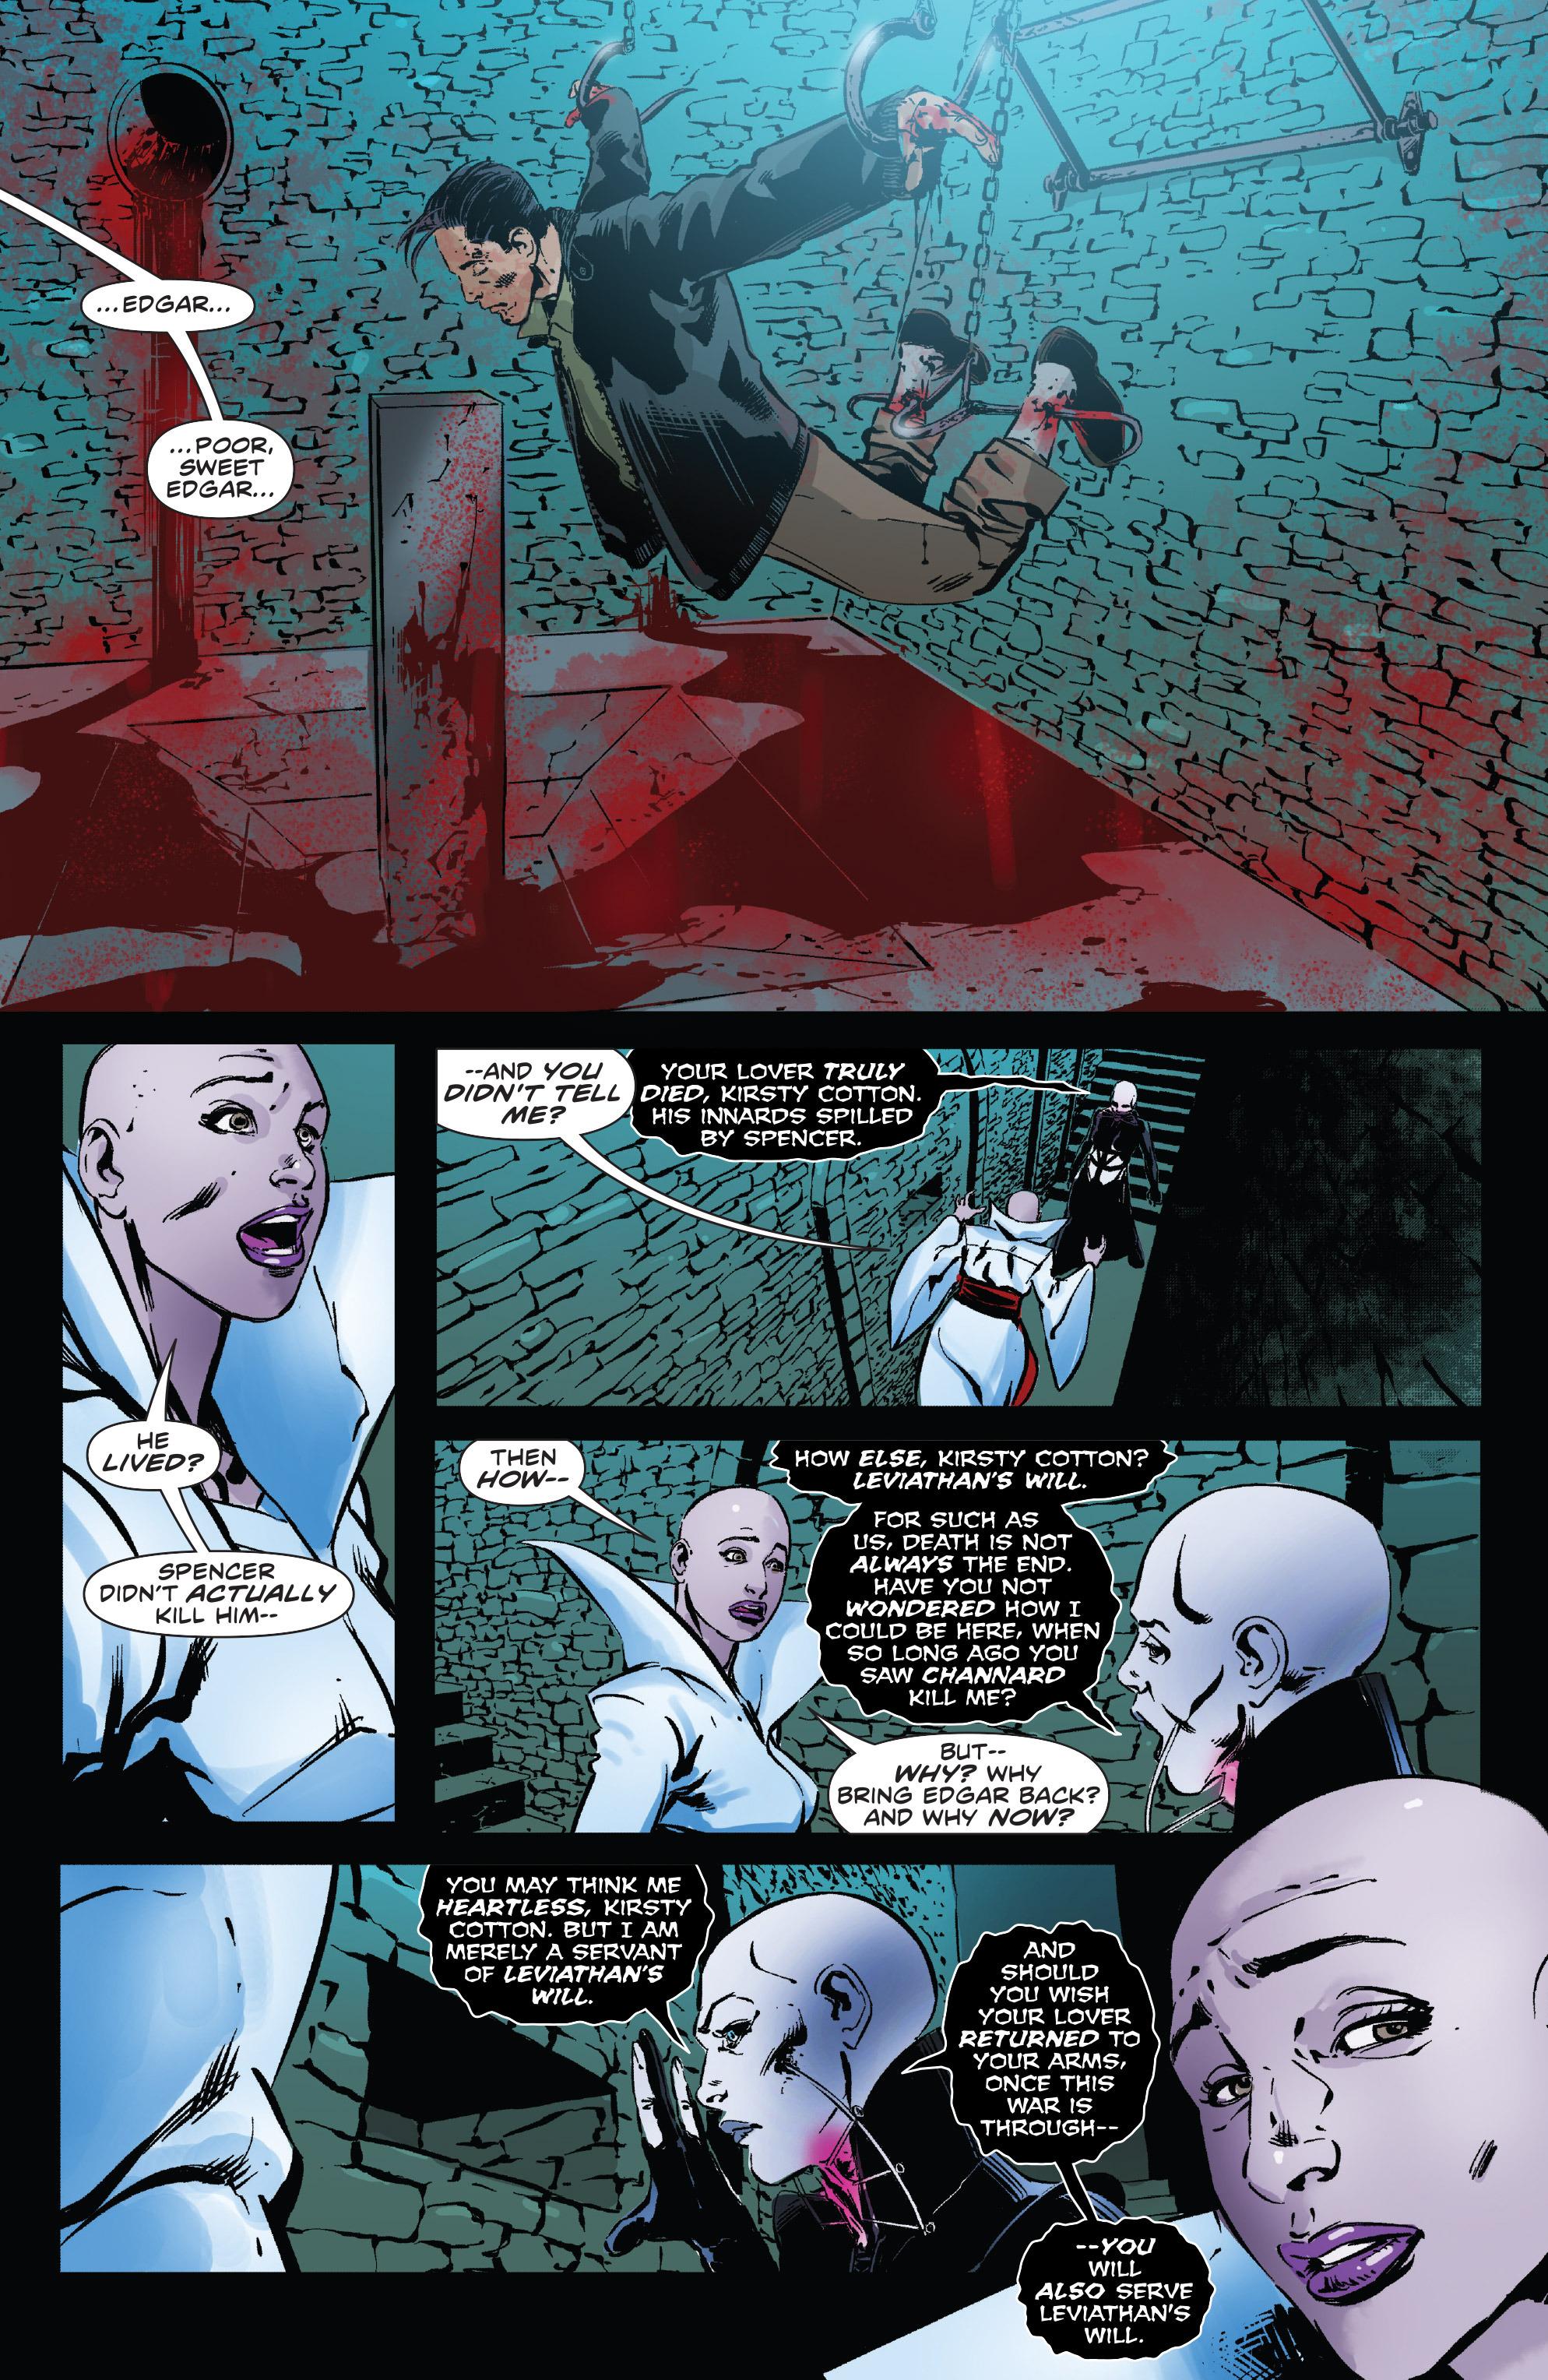 Read online Clive Barker's Hellraiser: The Dark Watch comic -  Issue # TPB 3 - 88